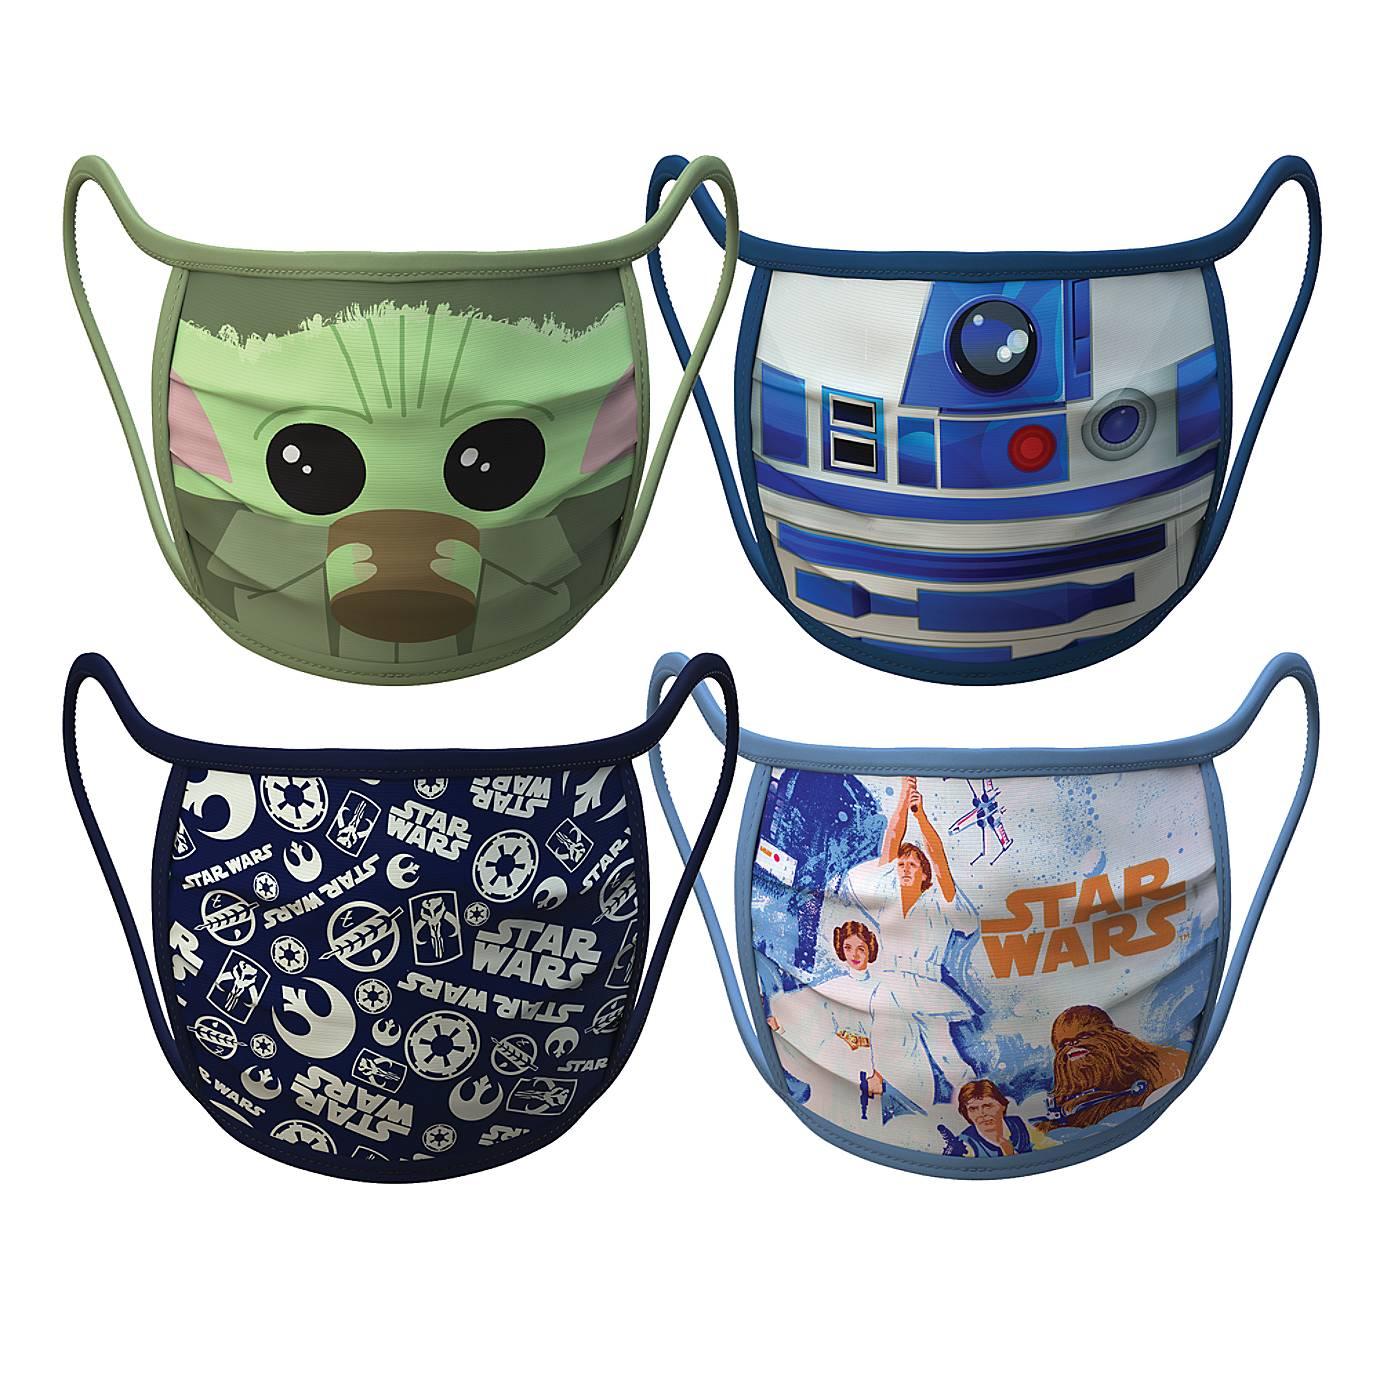 Star Wars Cloth Face Masks